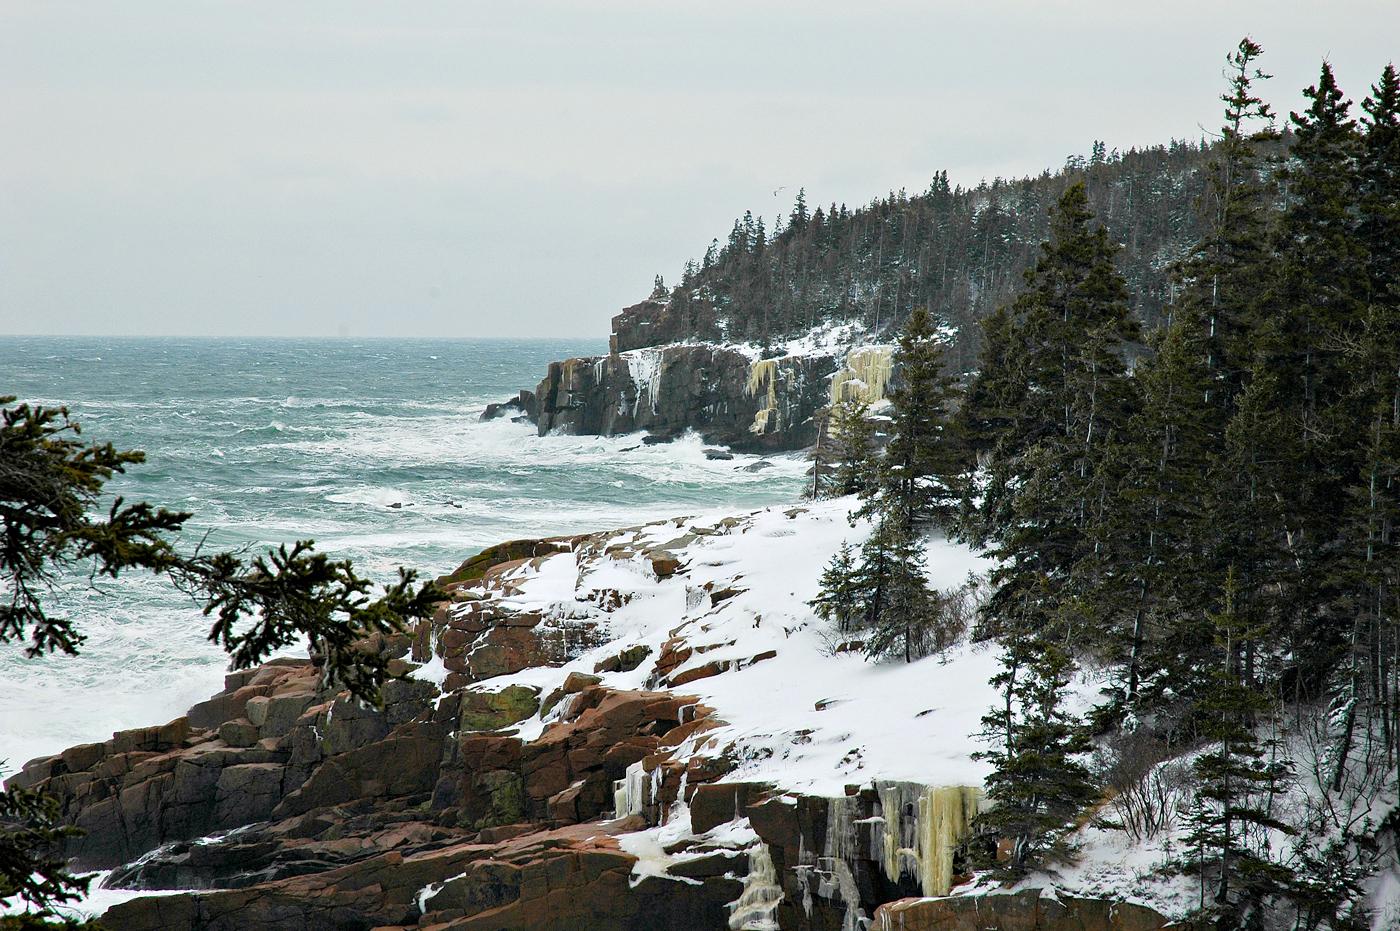 Acadia National Park | FL Doyle Photography: www.fldoyle.com/?page_id=25